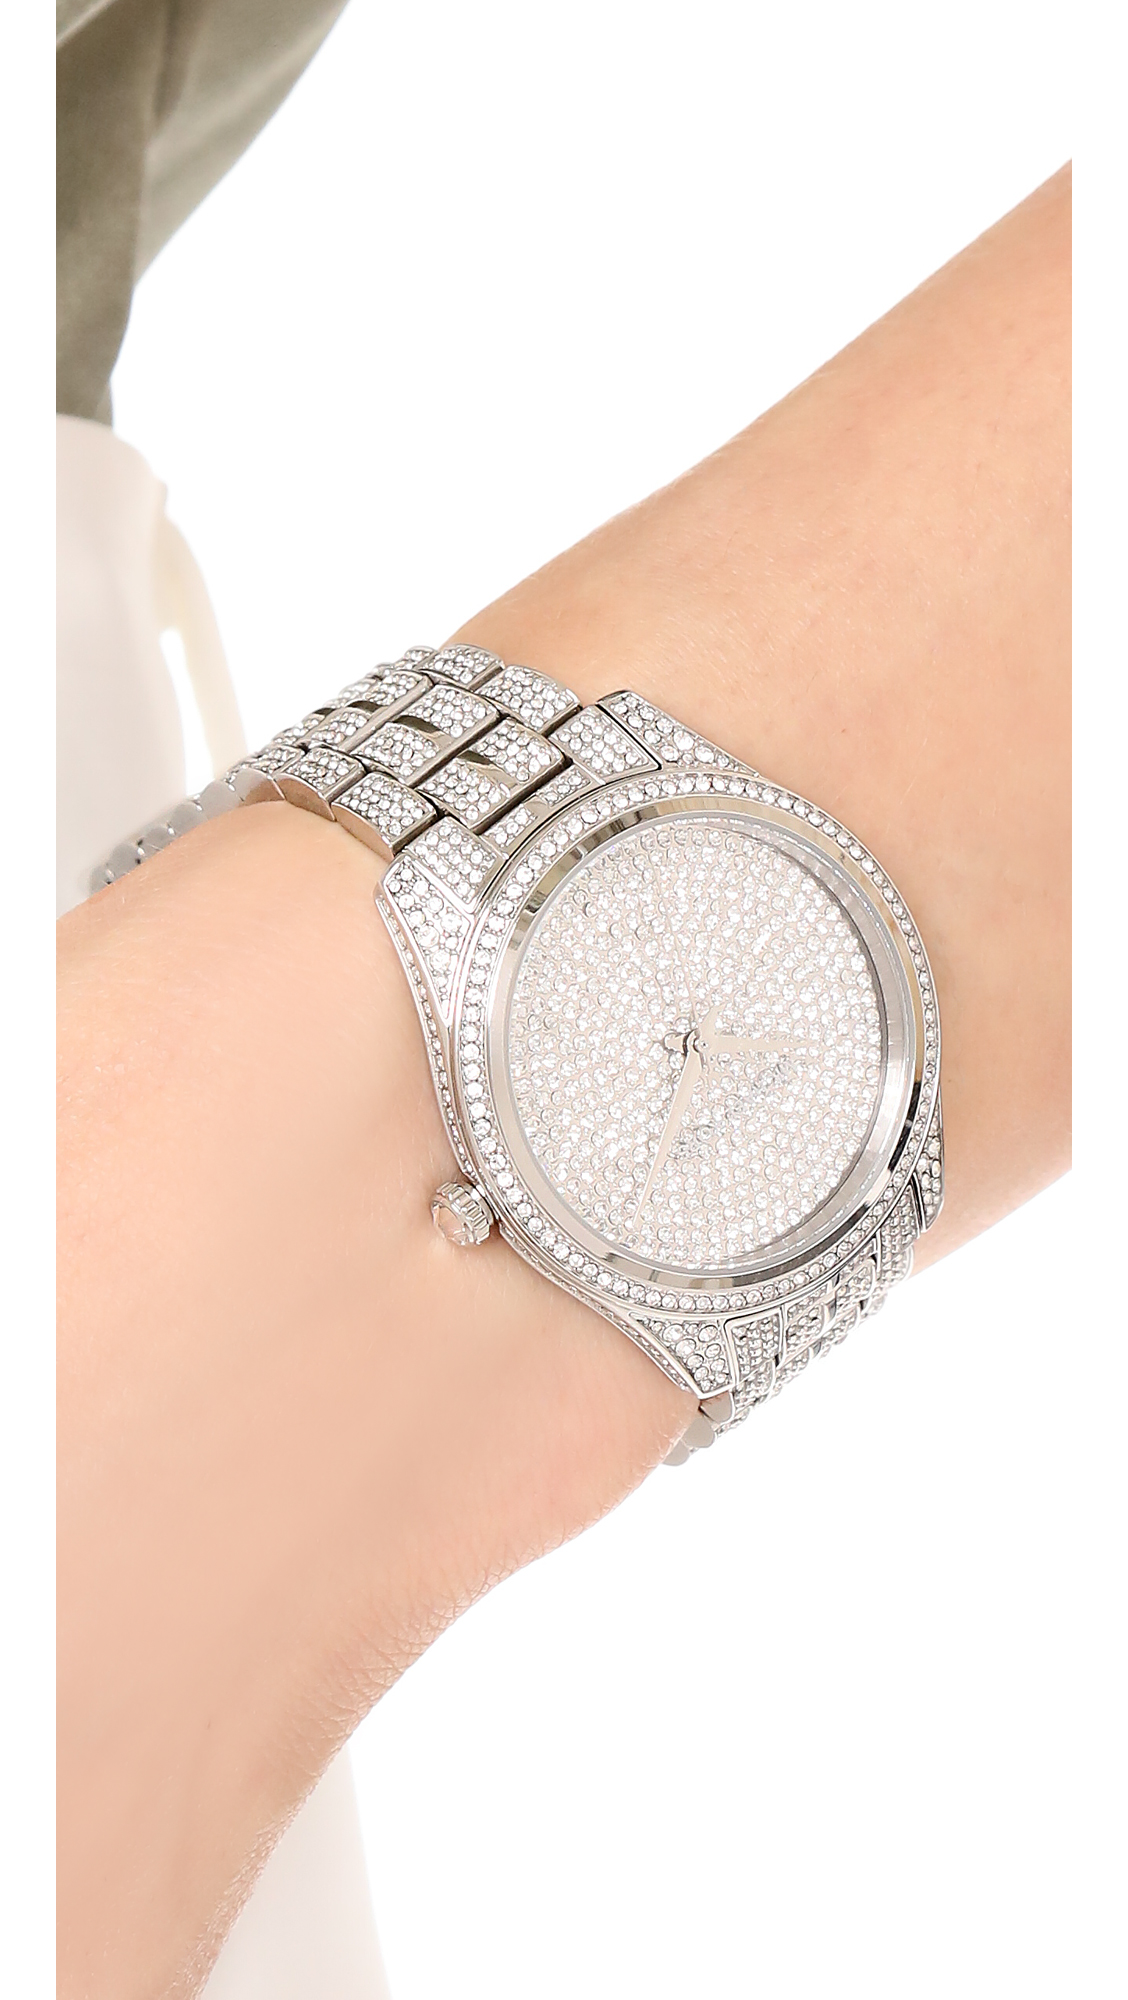 b67ec3472106 Michael Kors Lauryn Watch